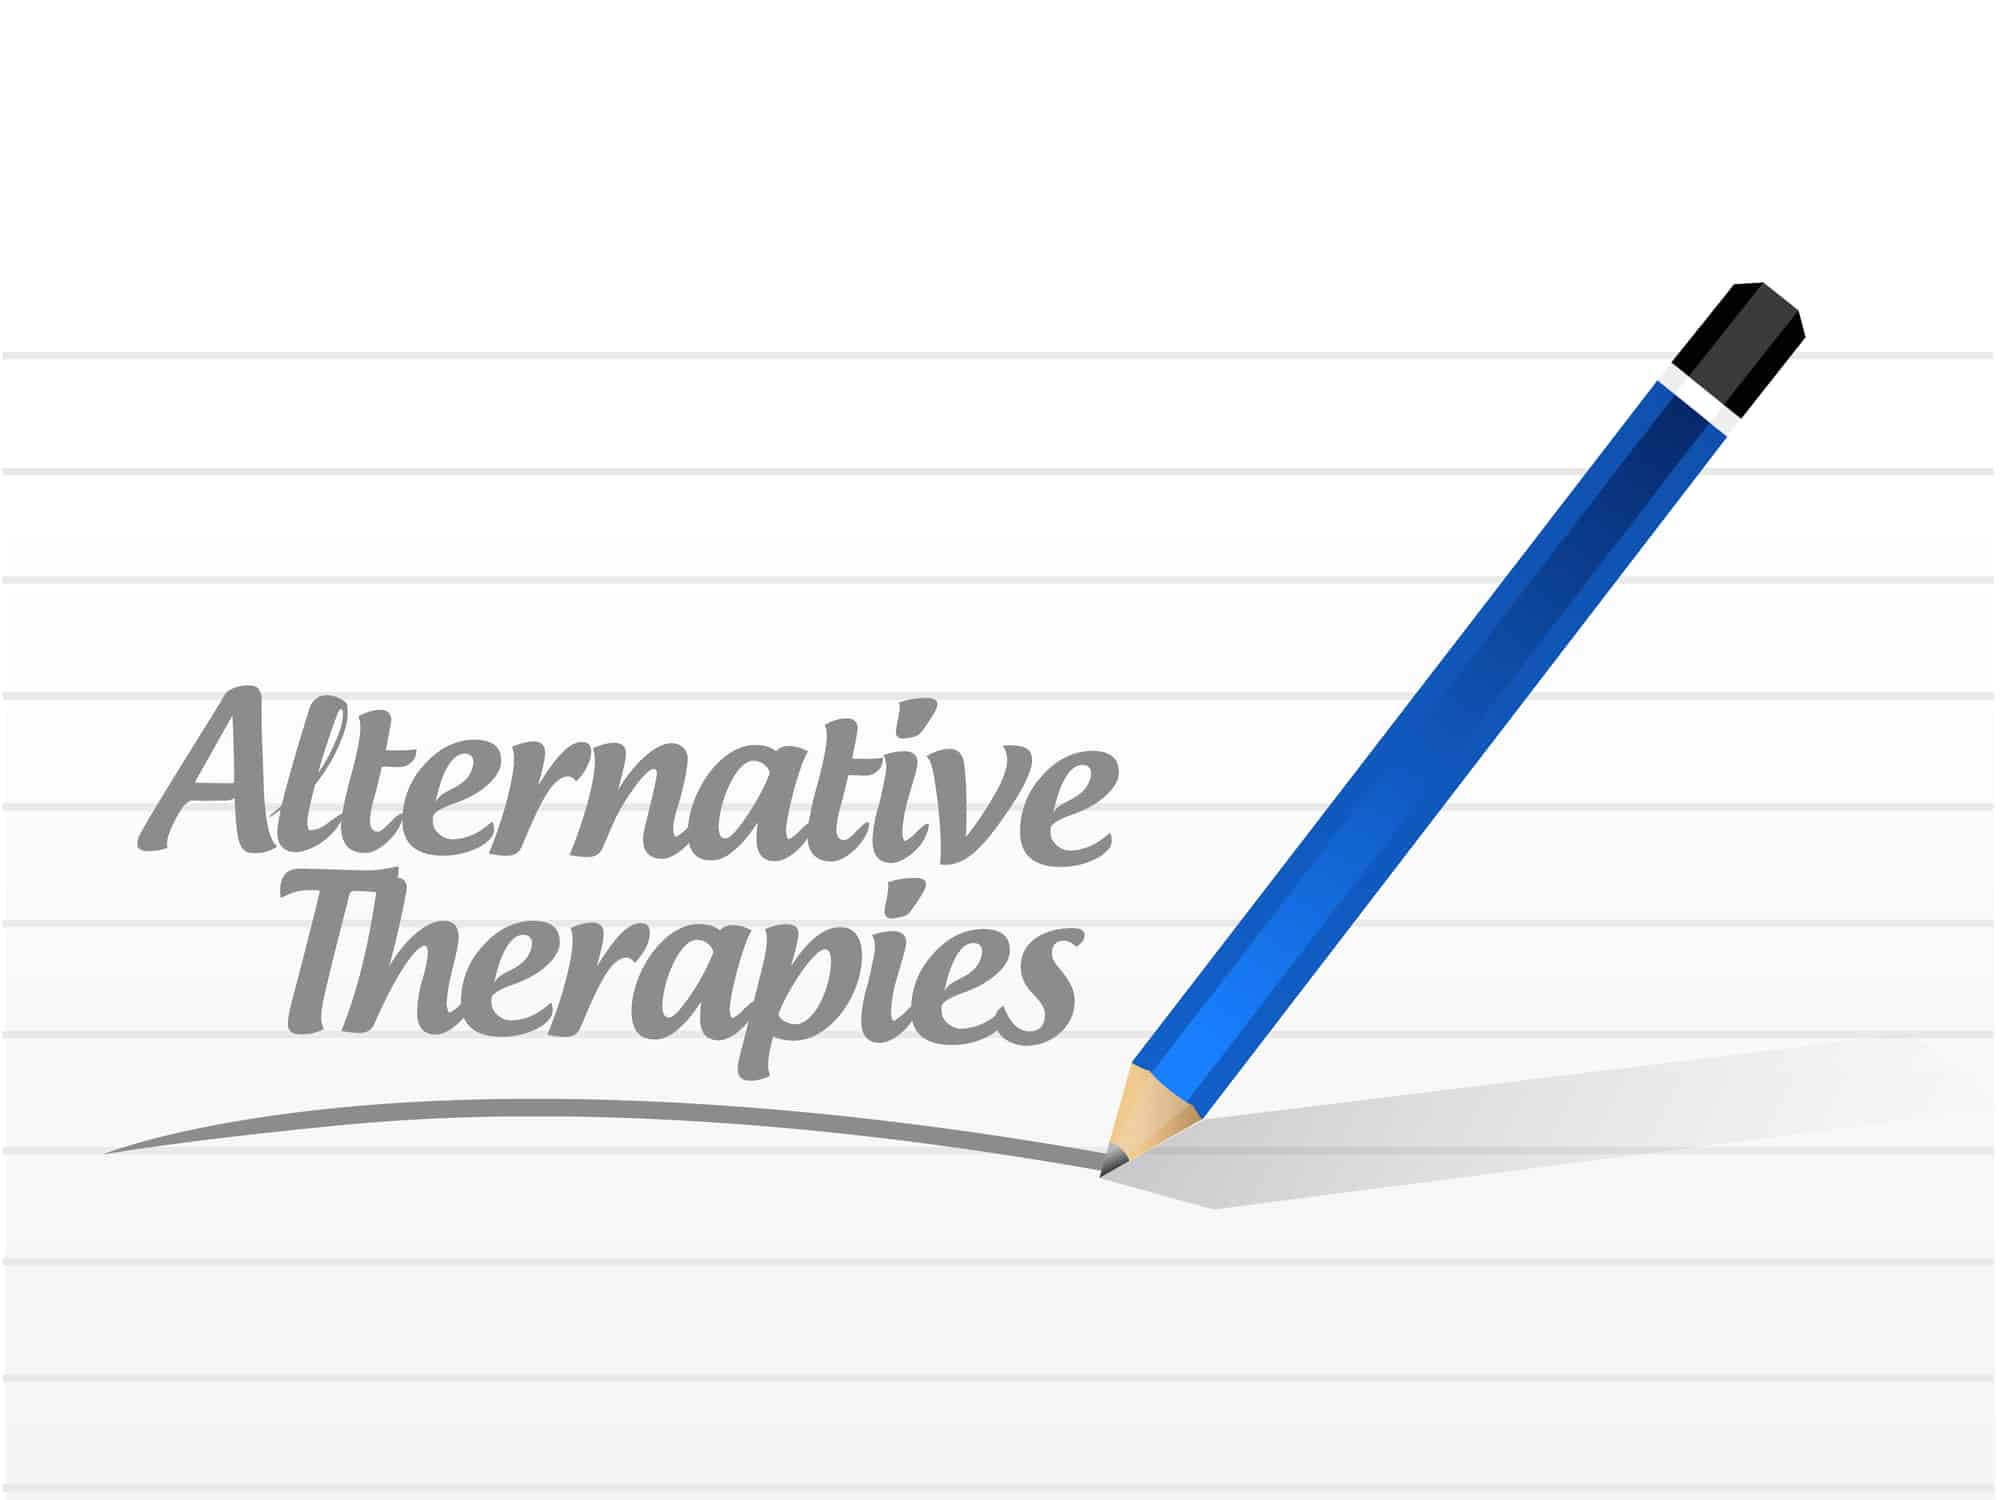 alternative treatments for autism spectrum disorder